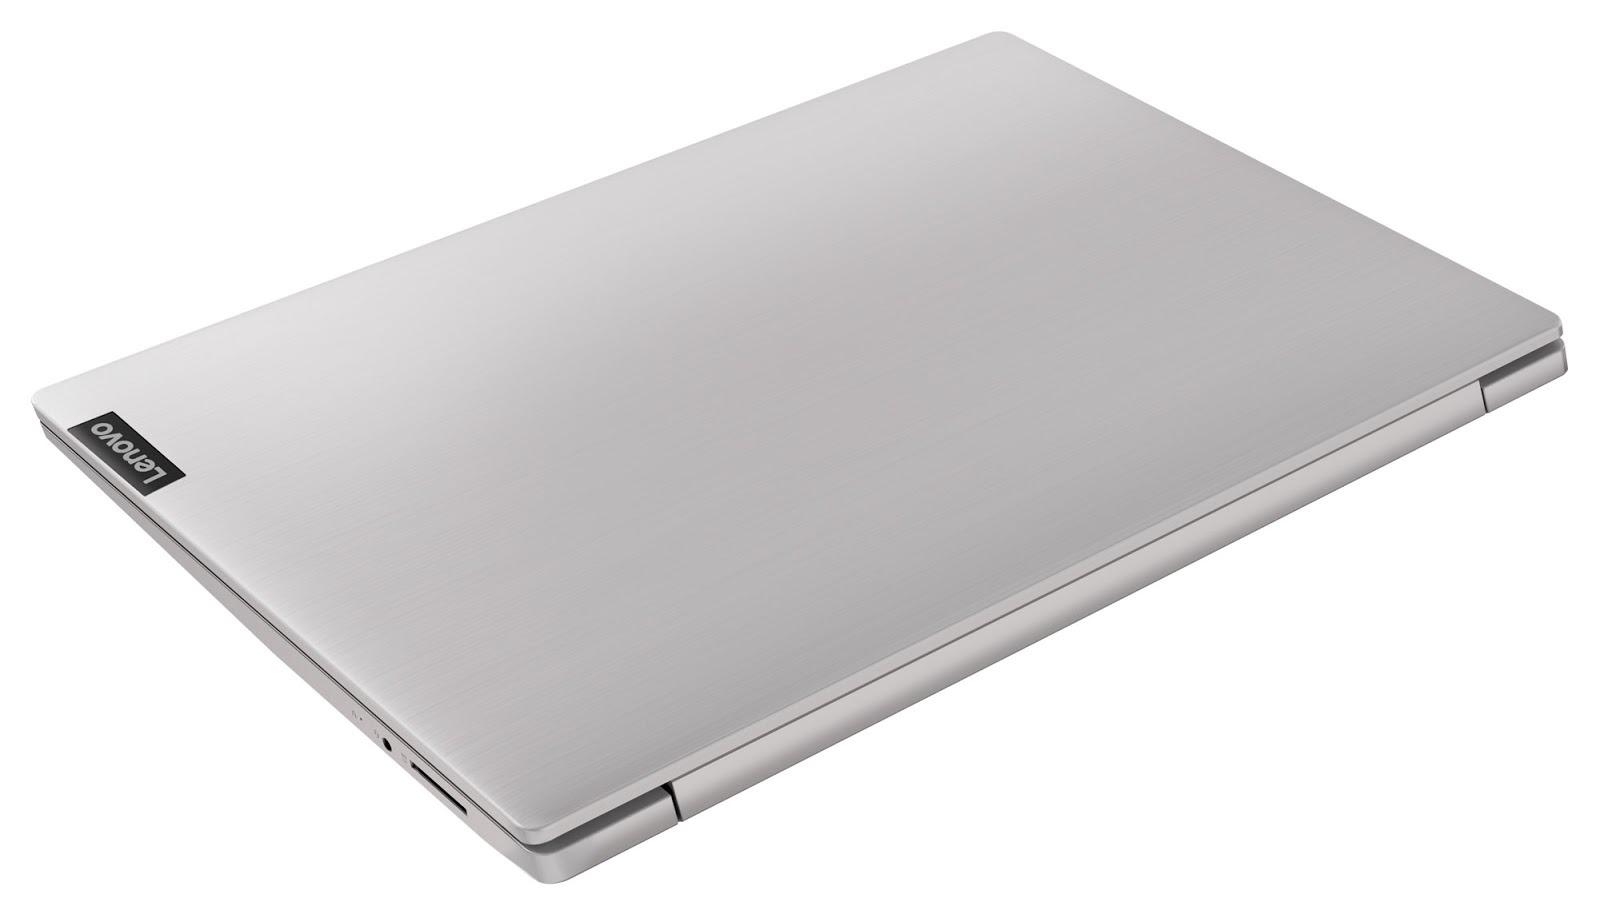 Фото 1. Ноутбук Lenovo ideapad S145-15IGM Grey (81MX001JRE)